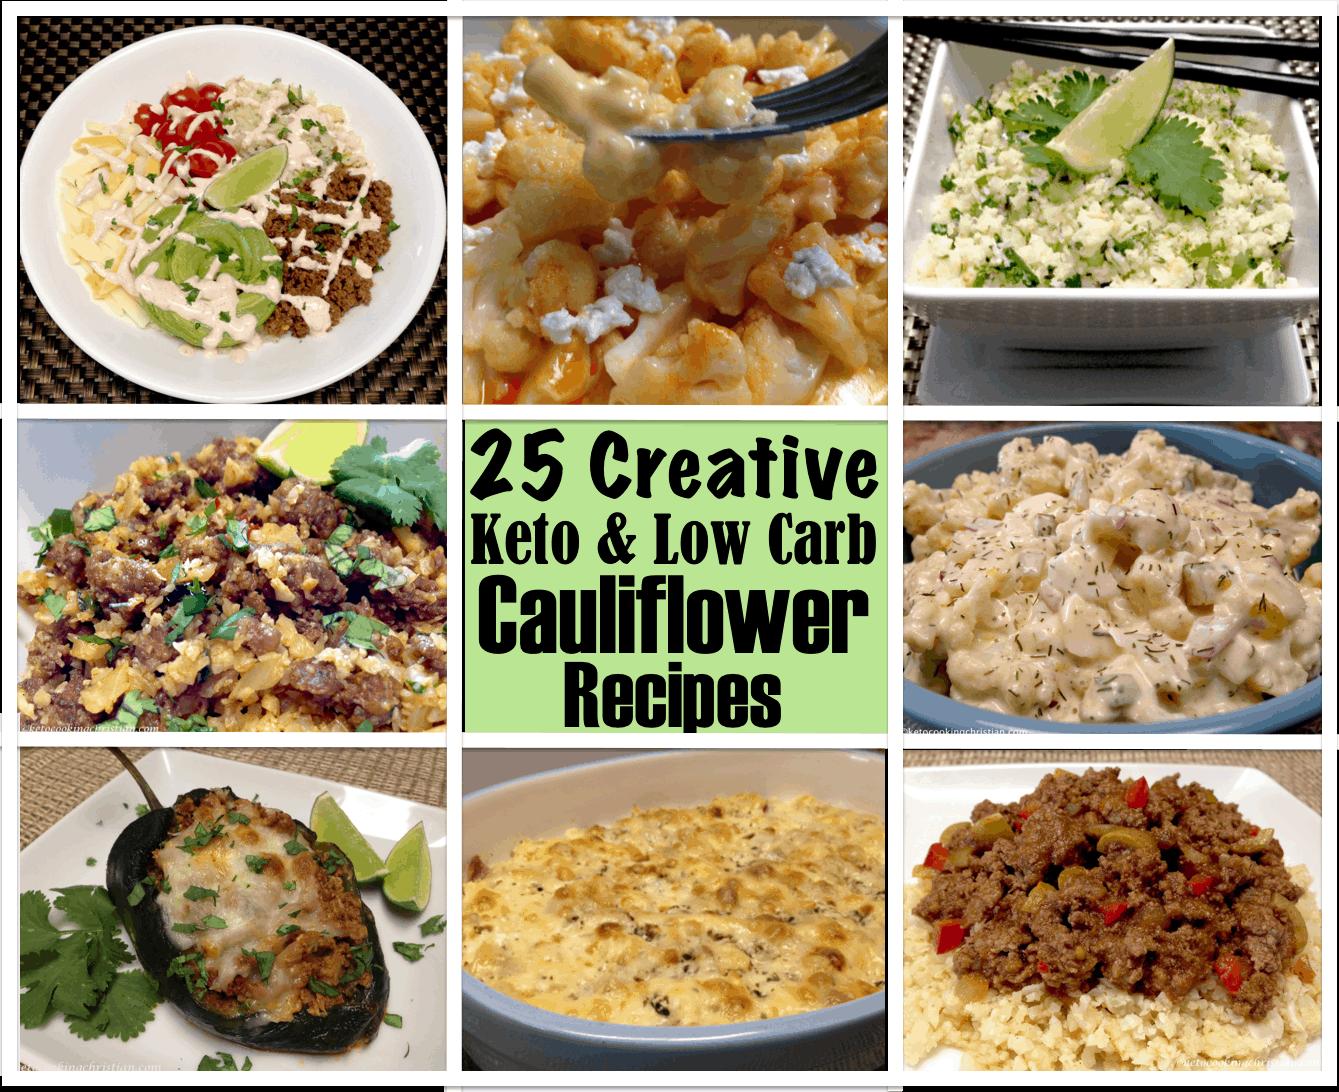 25 Creative Keto and Low Carb Cauliflower Recipes